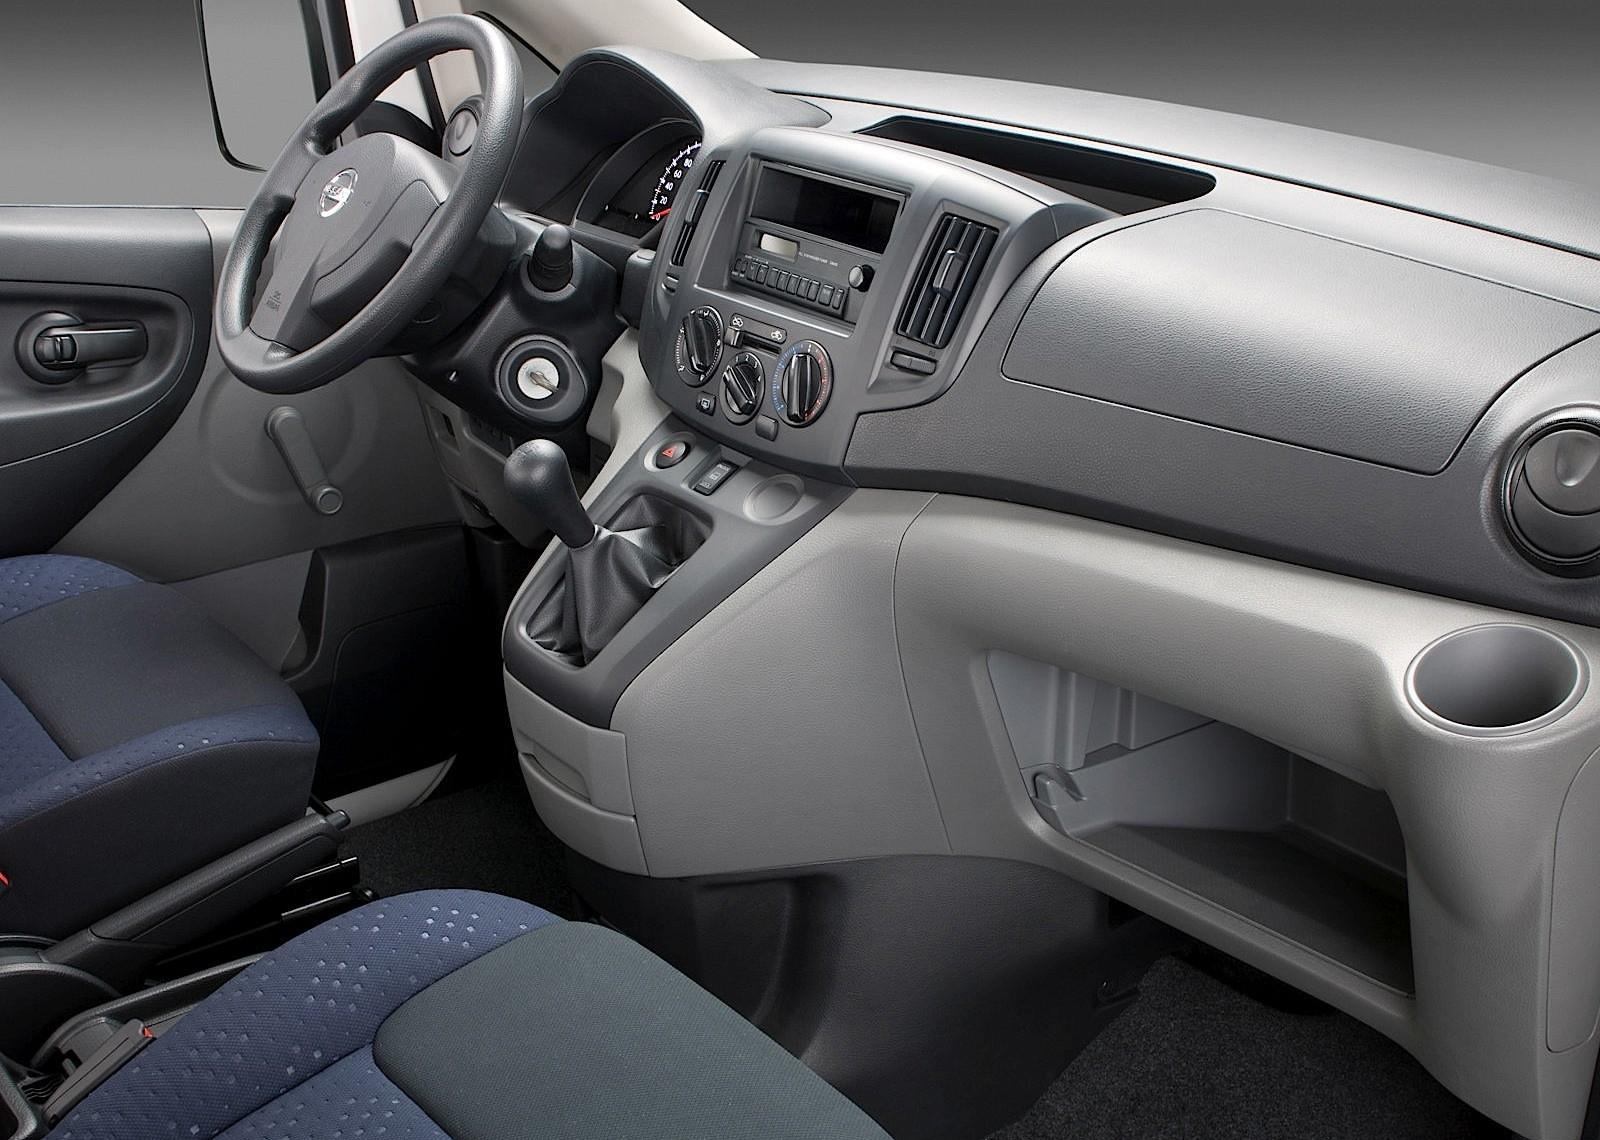 Nissan Nv Passenger >> NISSAN NV200 specs & photos - 2009, 2010, 2011, 2012, 2013, 2014, 2015, 2016, 2017, 2018 ...